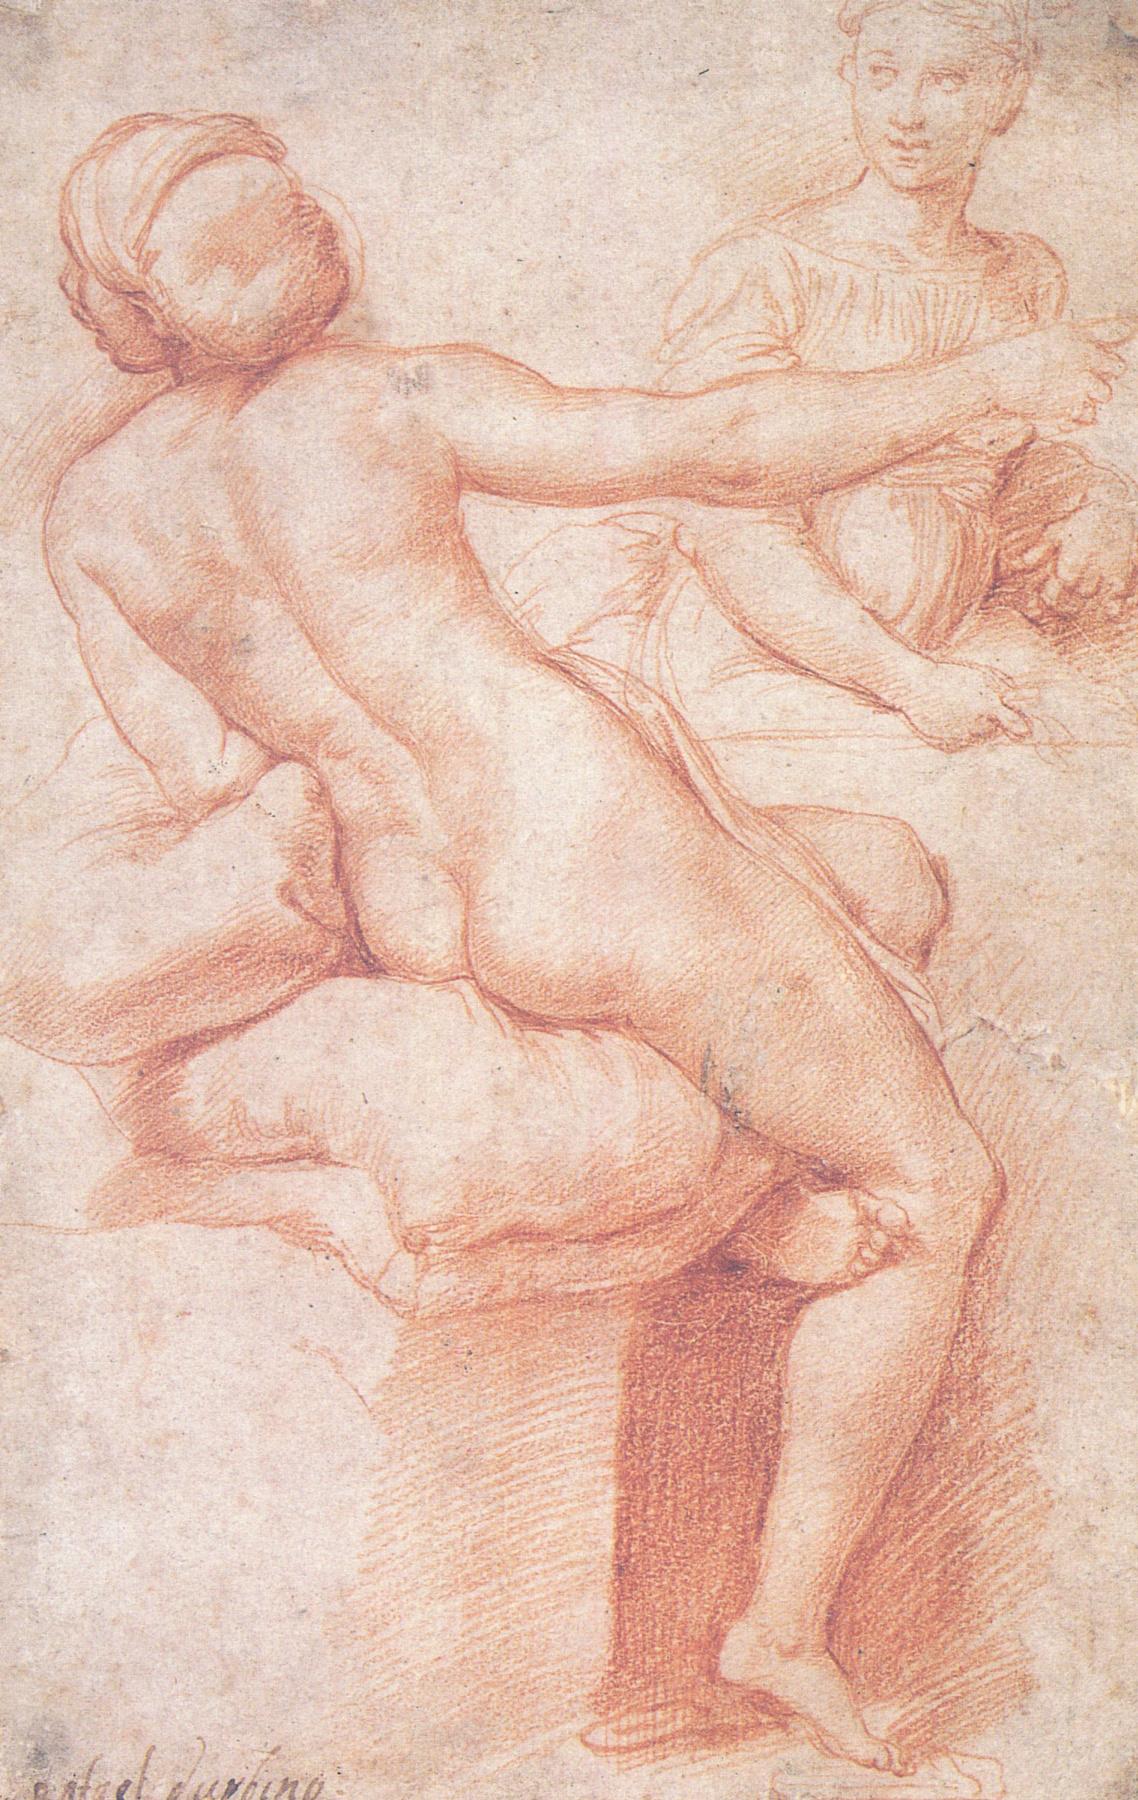 Raphael Sanzio. Hebe and Proserpine. Etude